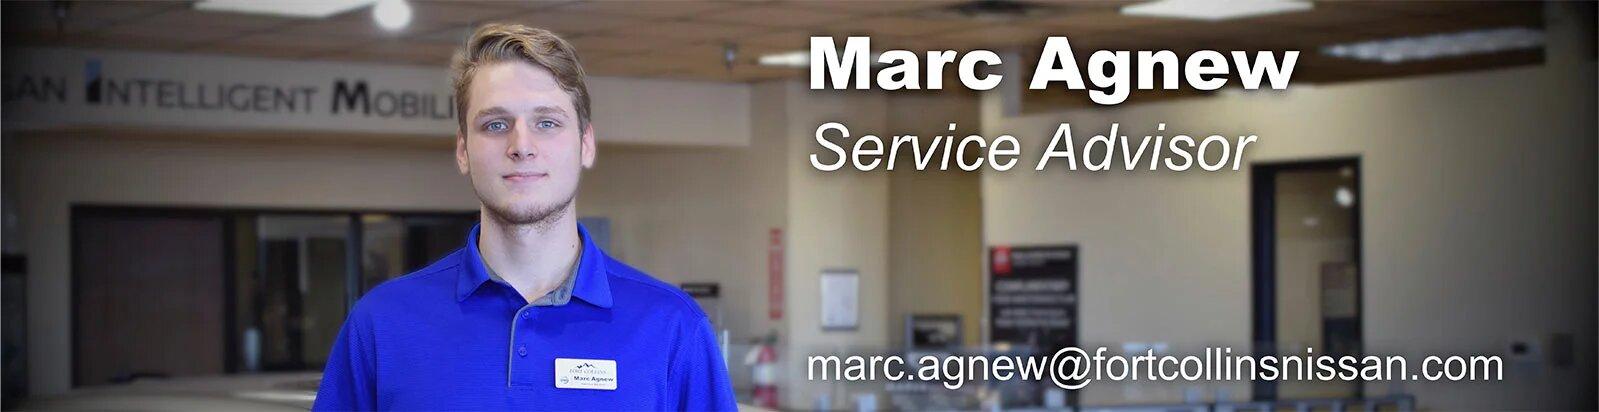 Service Advisor Marc Agnew